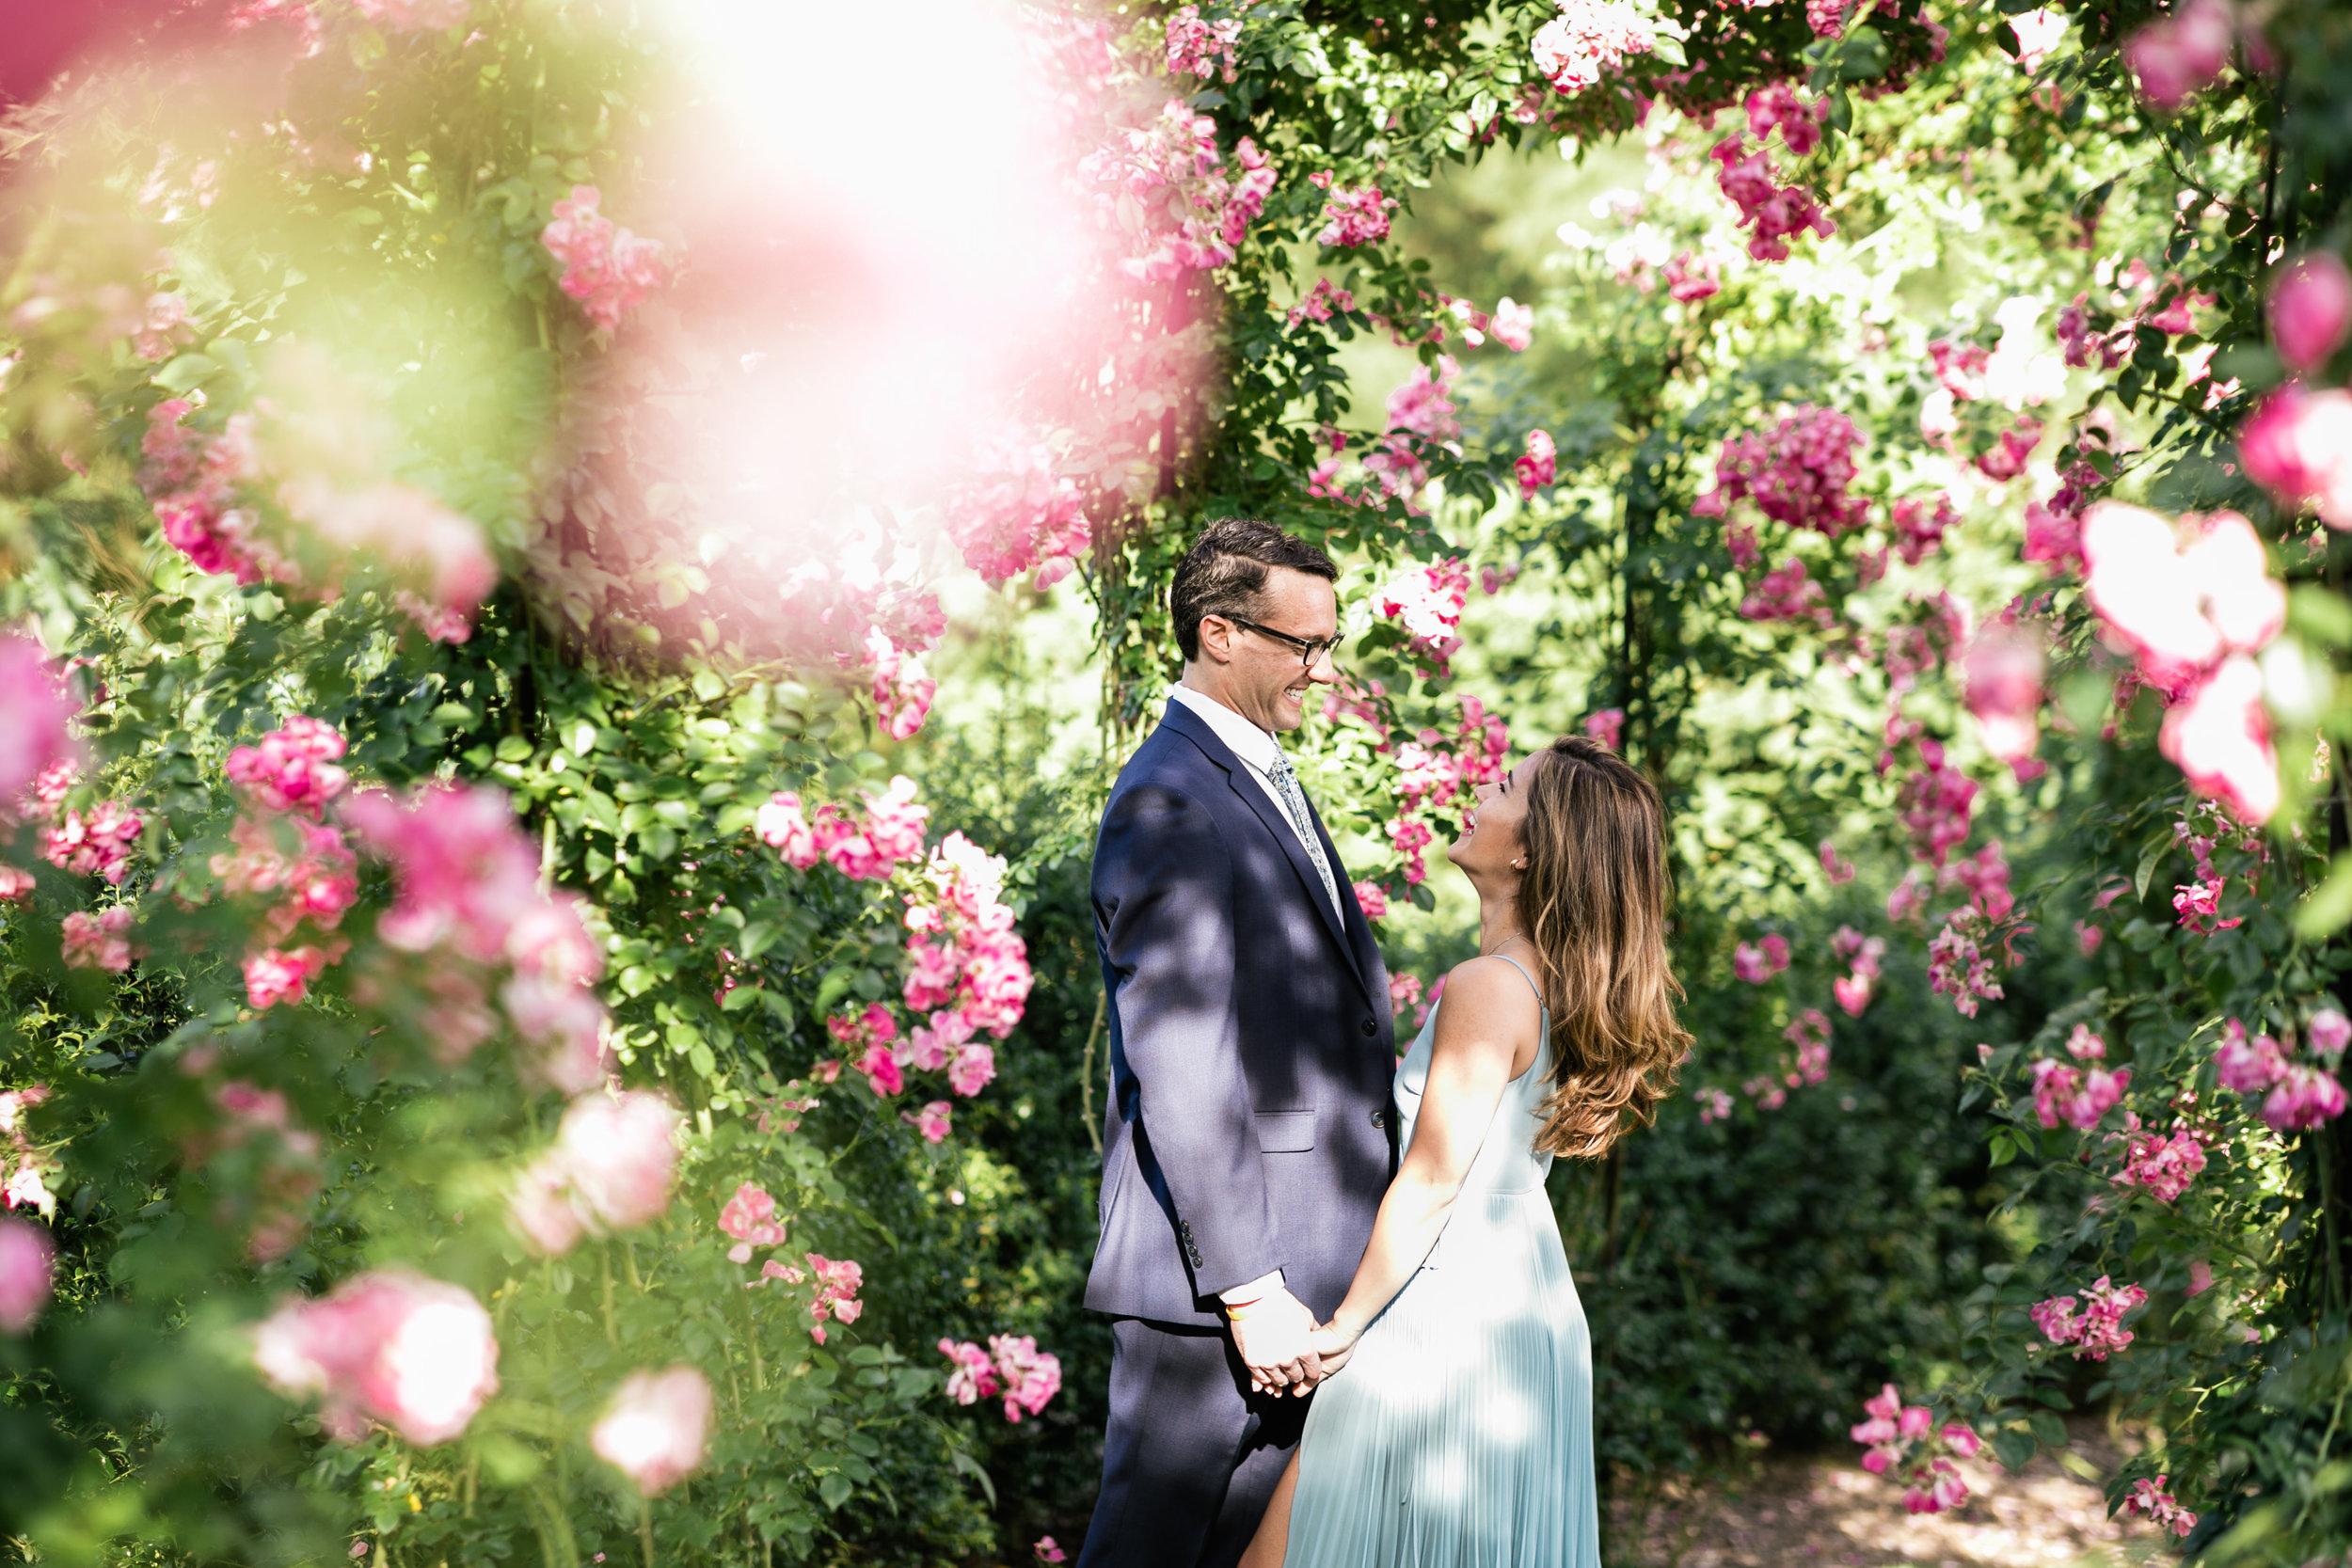 photography-natural-candid-engaged-proposal-philadelphia-wedding-longwood gardends-nature-flowers-modern-lifestyle-01.JPG